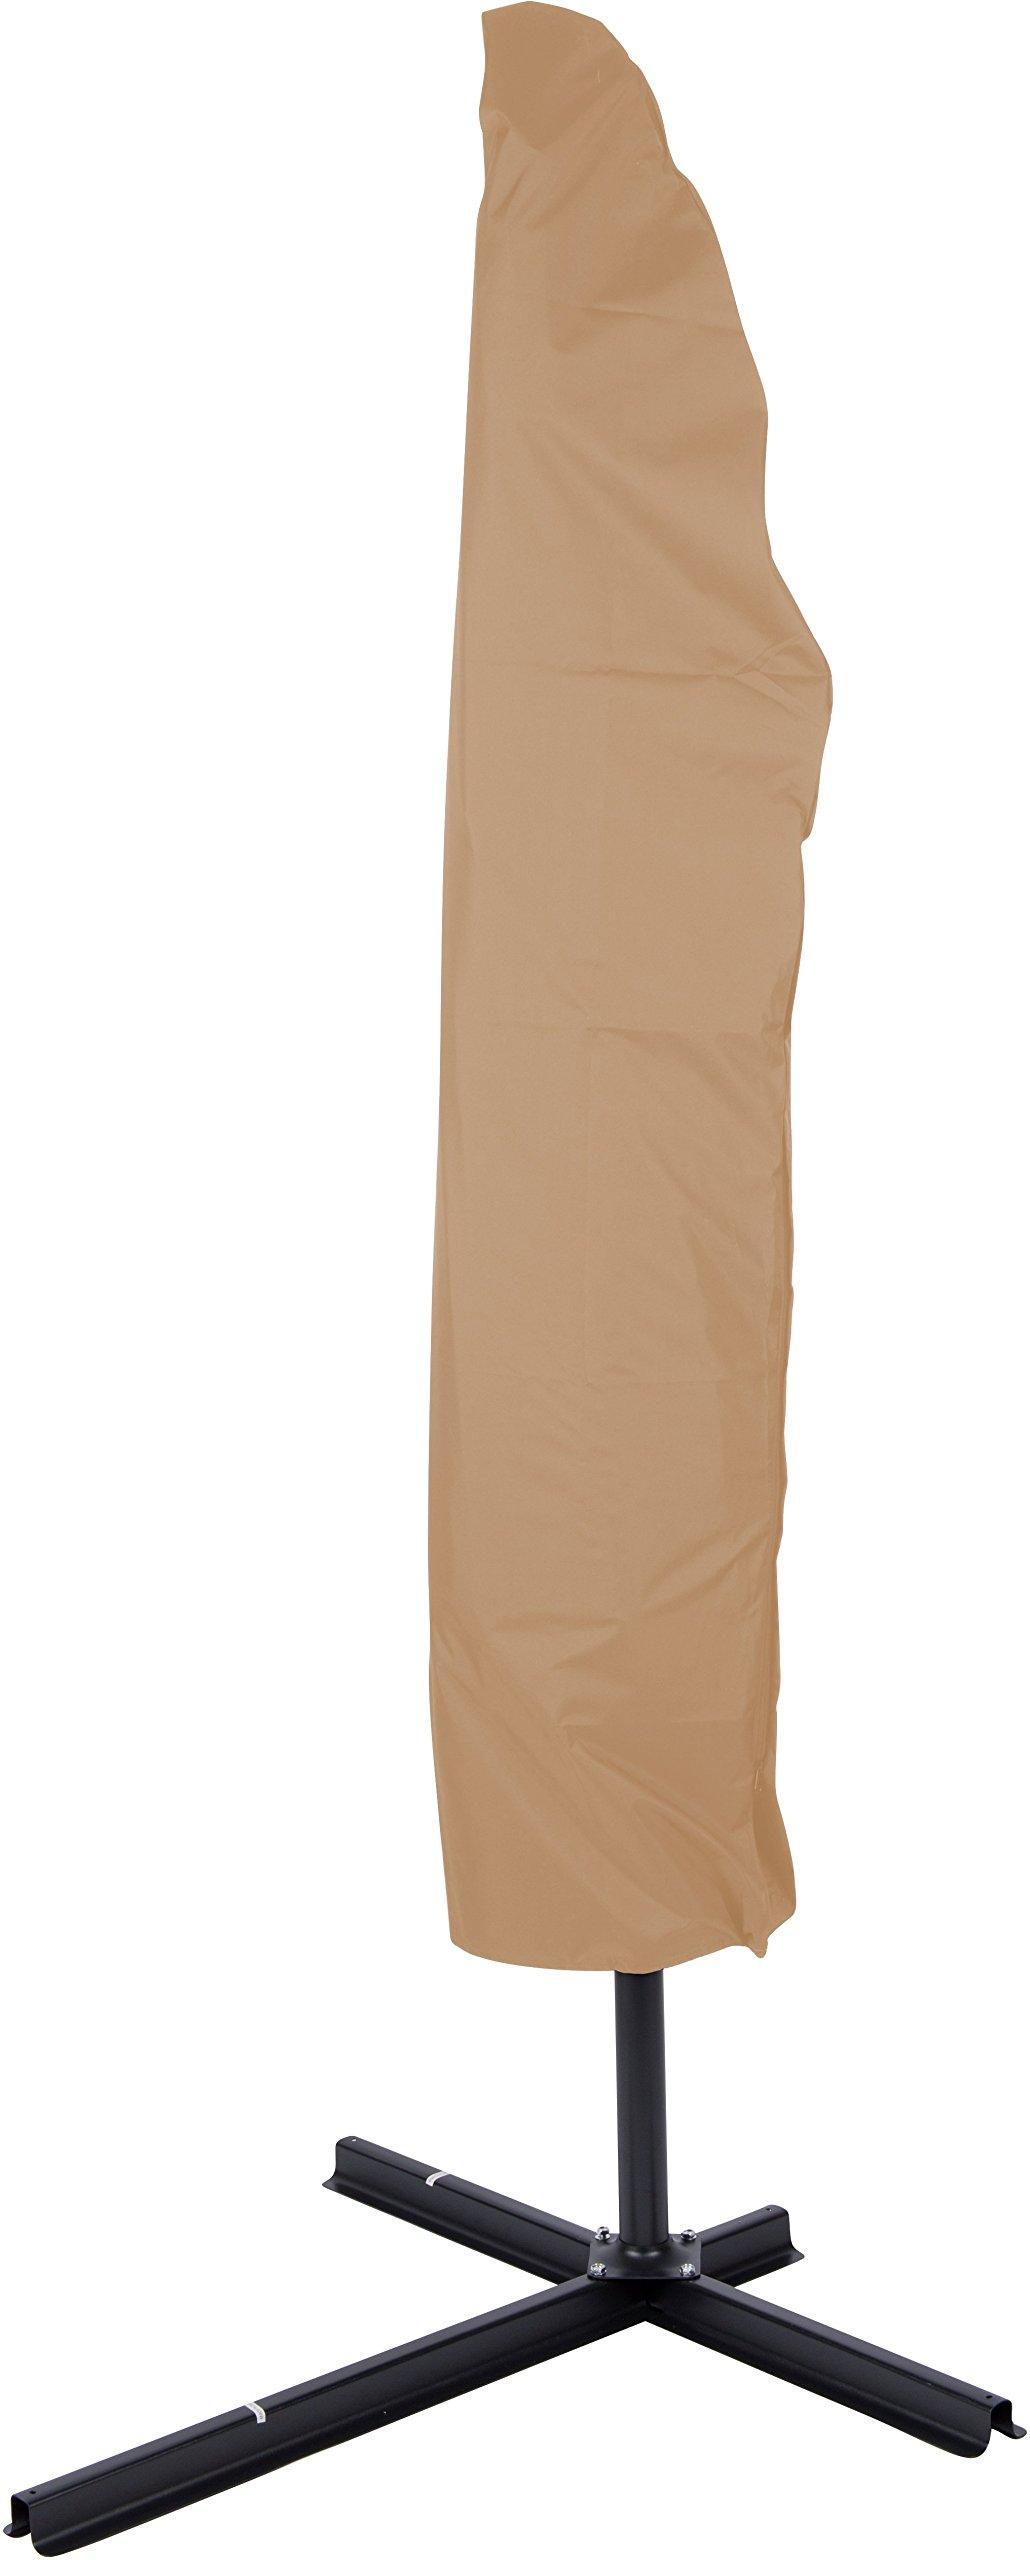 Trademark Innovations Offset Umbrella Cover for Patio Umbrella, Tan, 10'